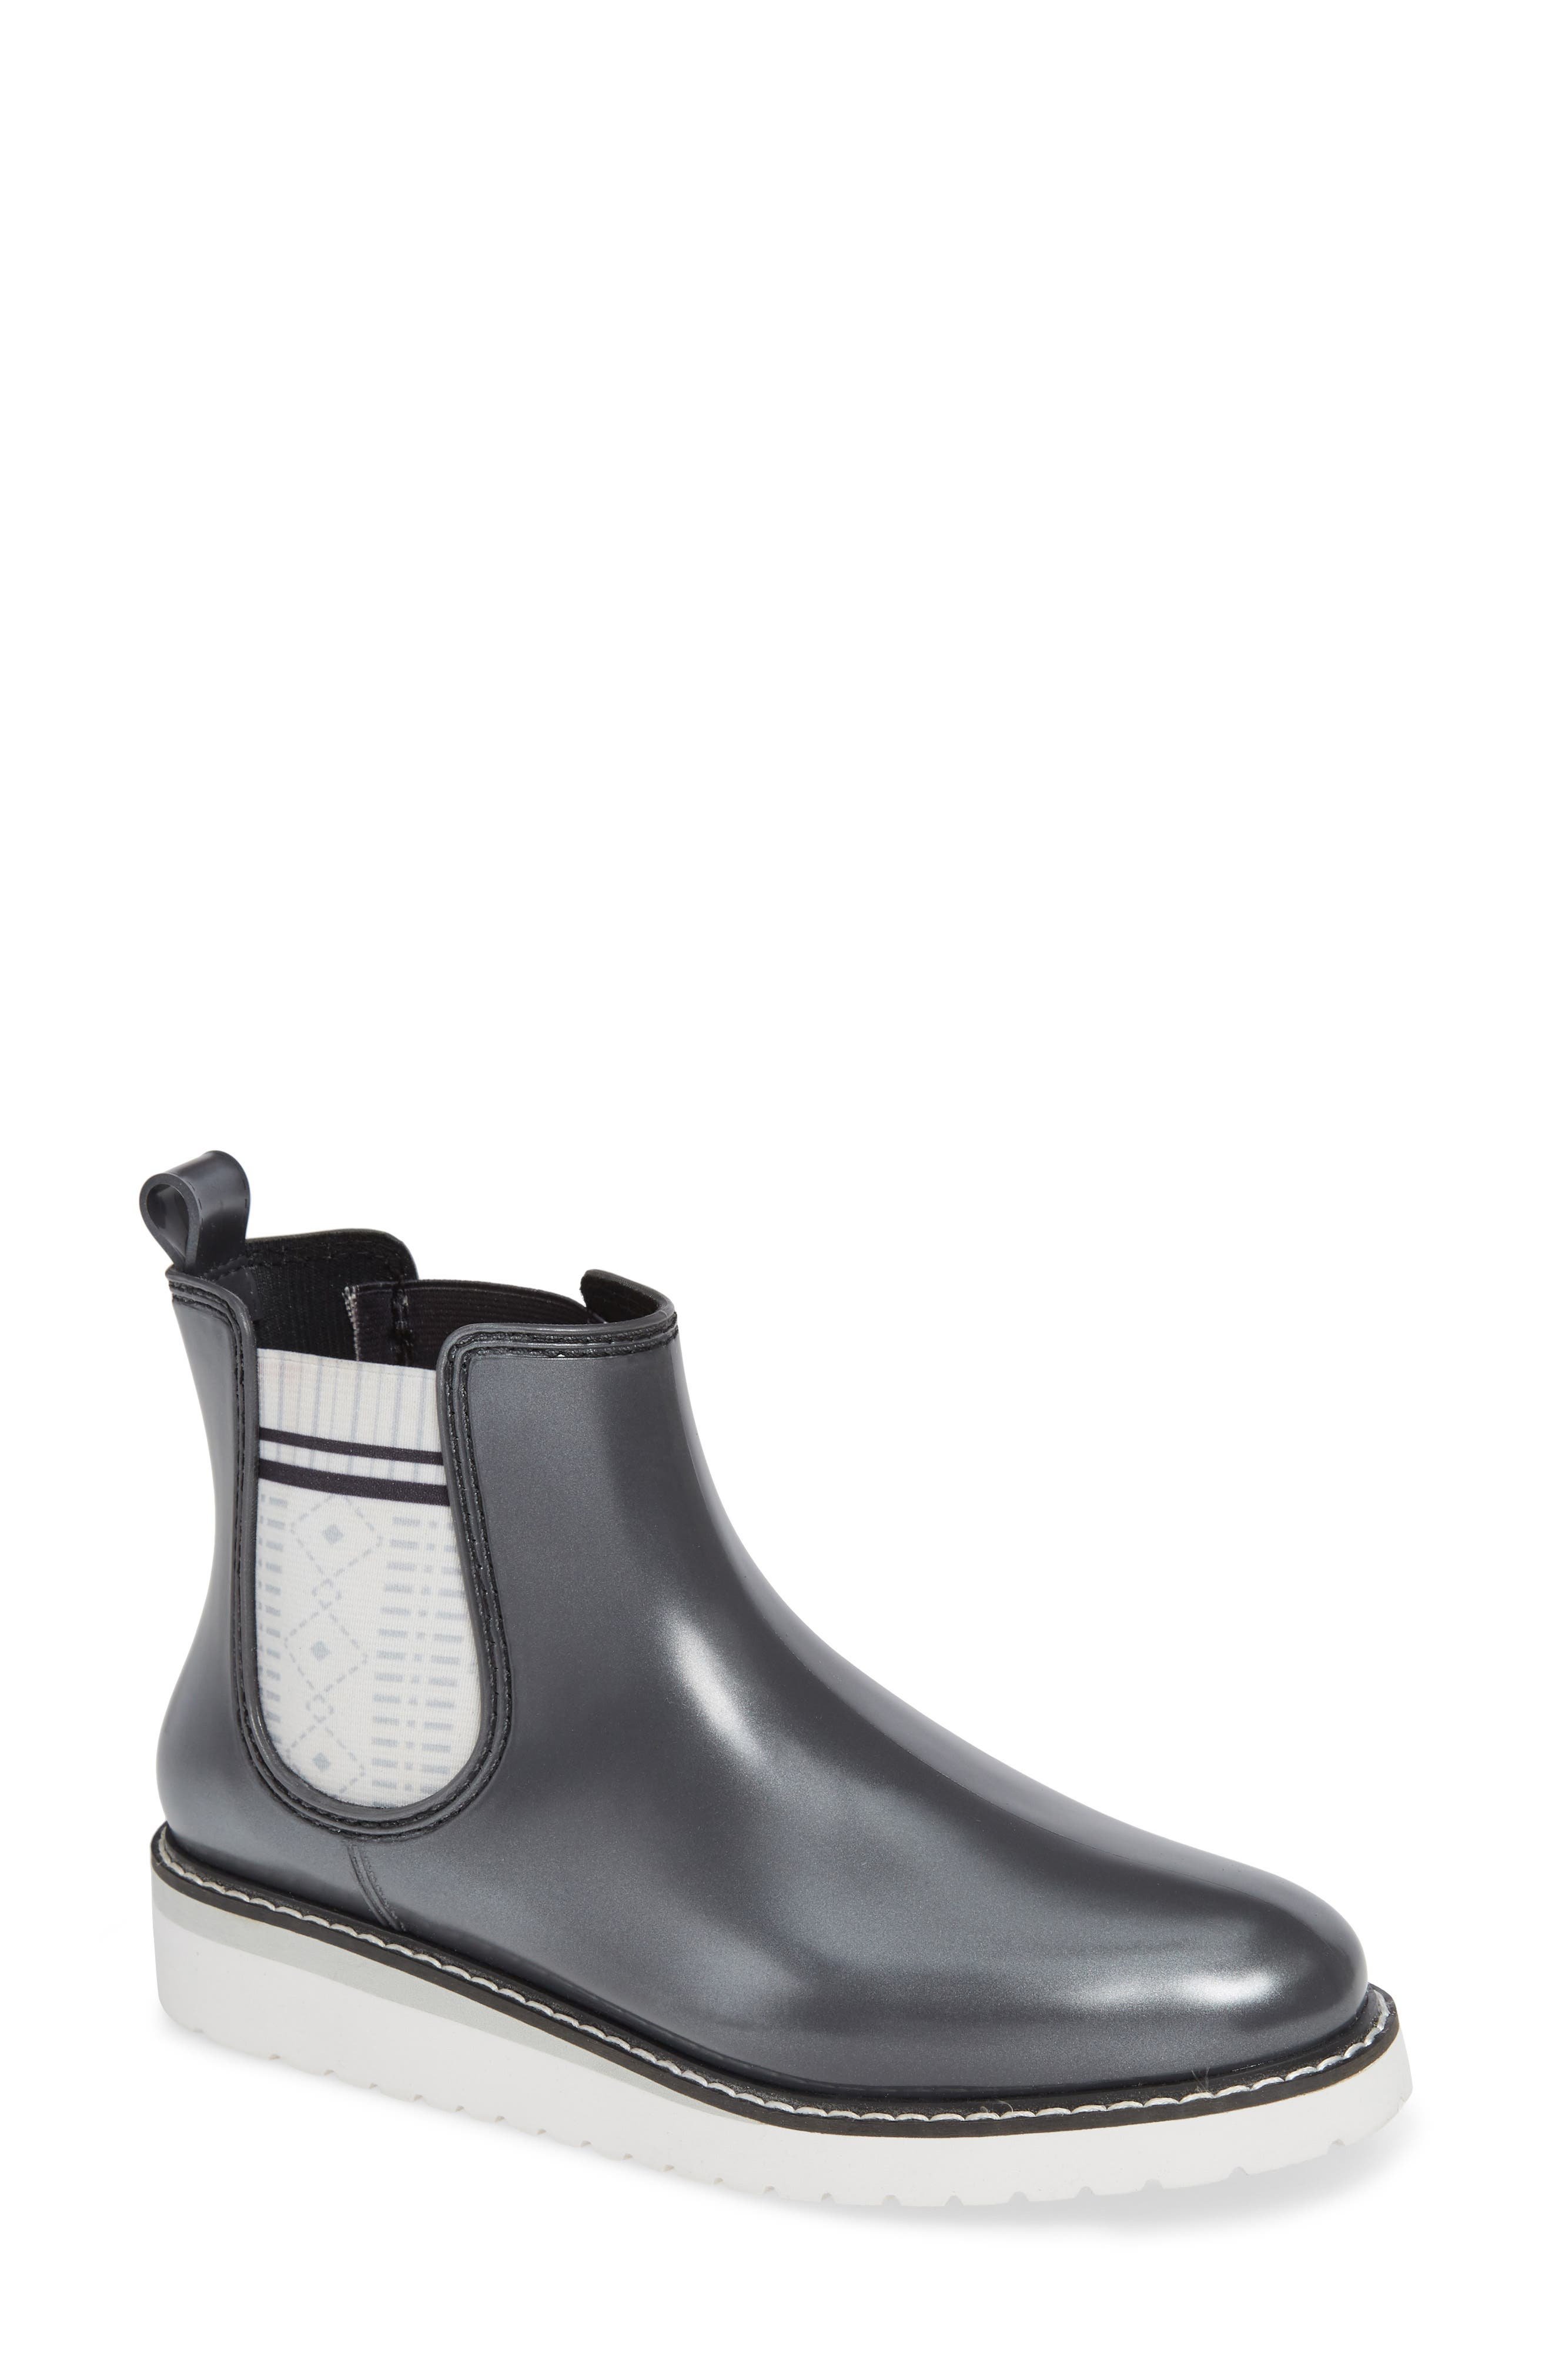 Kensington Chelsea Rain Boot,                             Main thumbnail 1, color,                             SILVER METALLIC